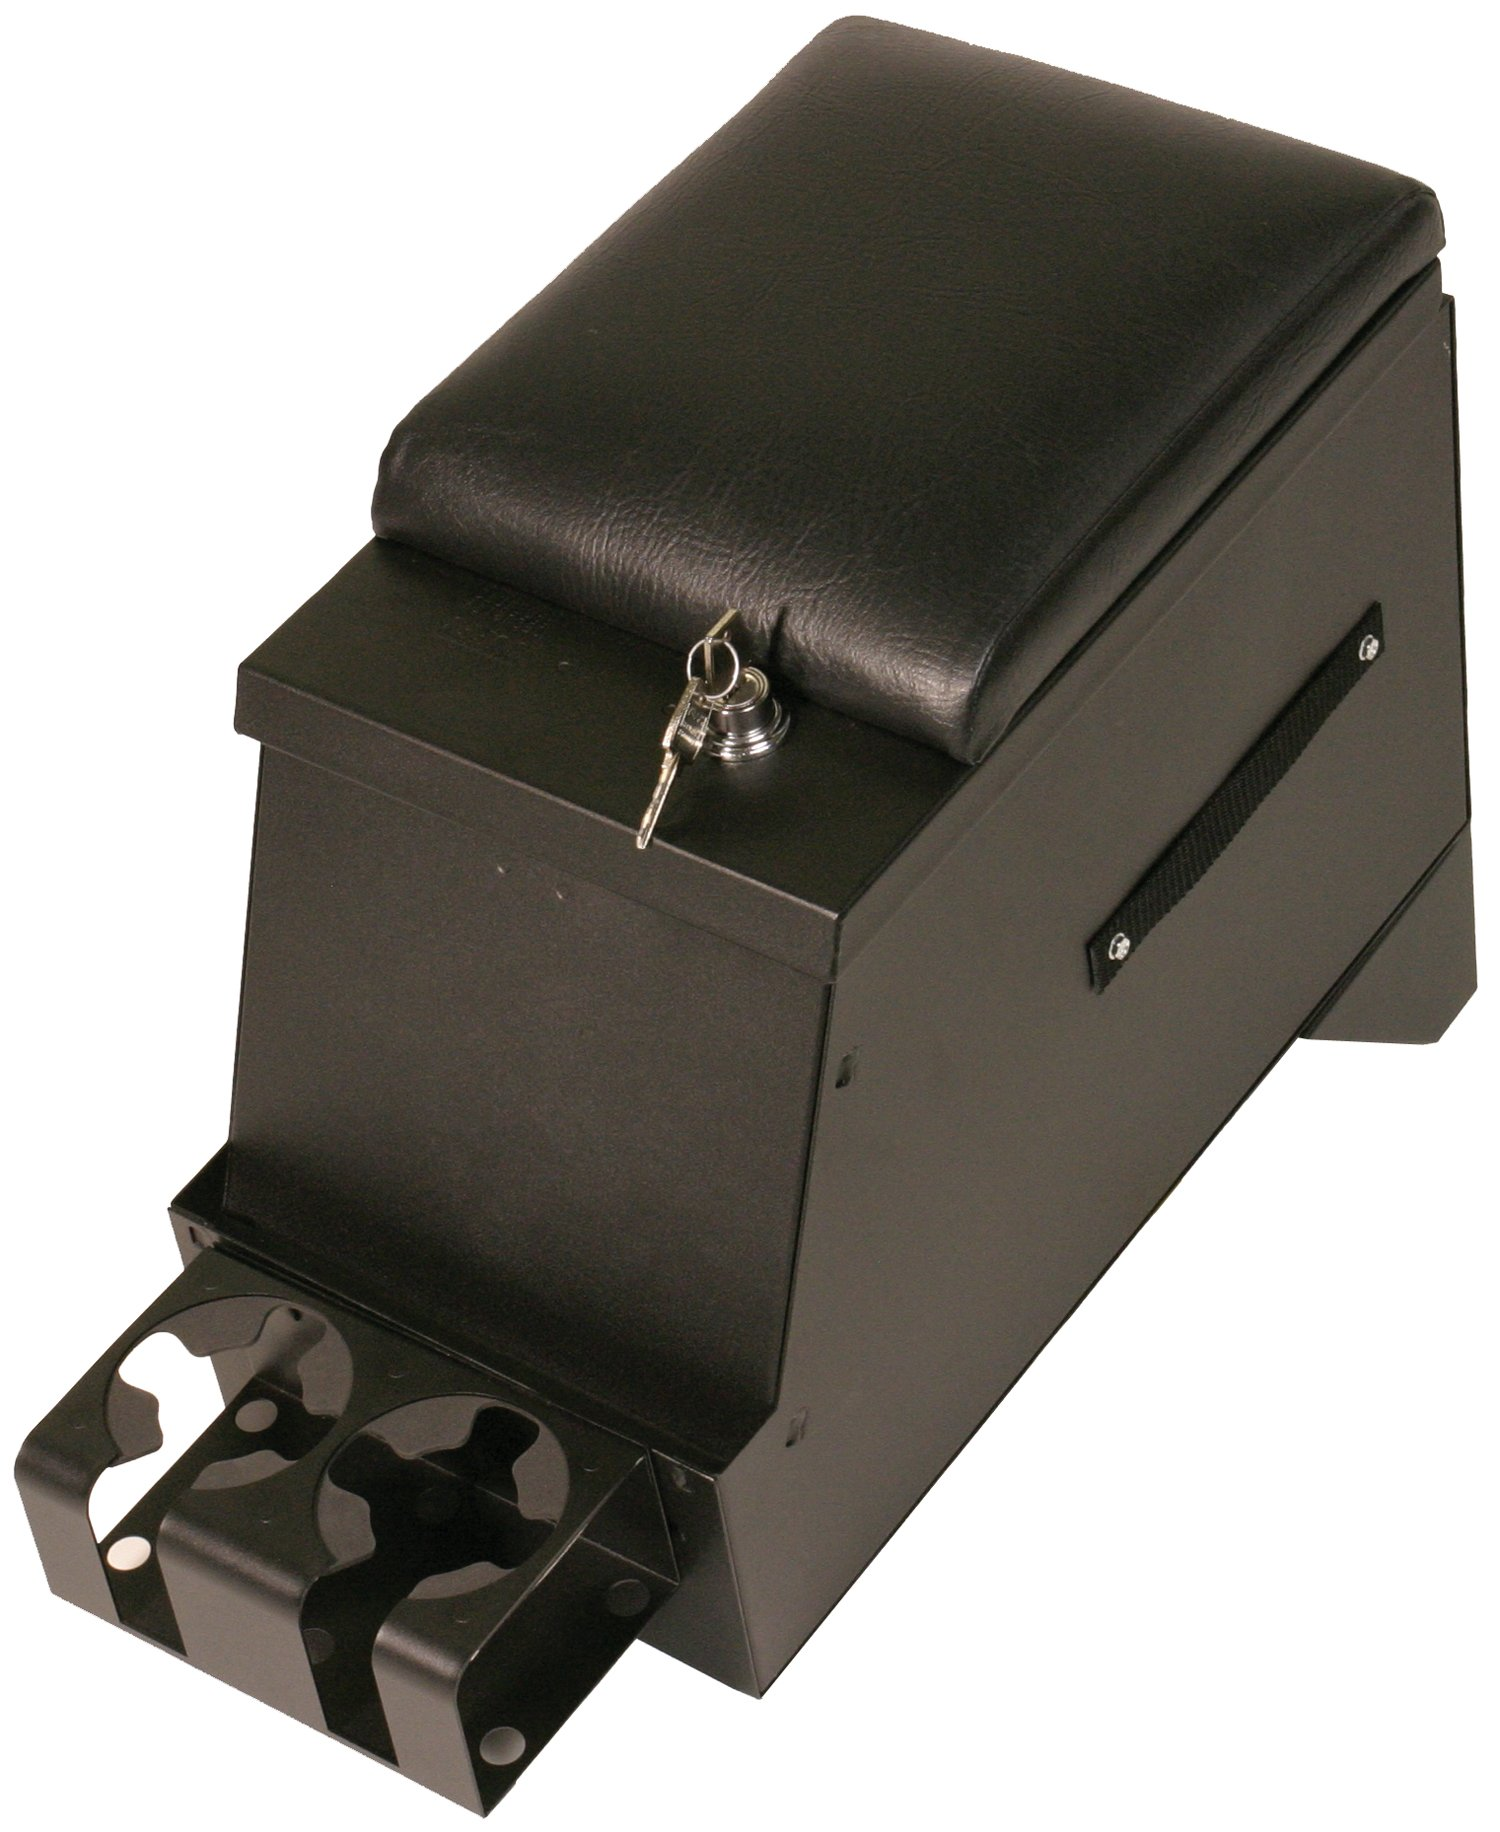 Tuffy 032-01 Series Ii Console 10'' -Black